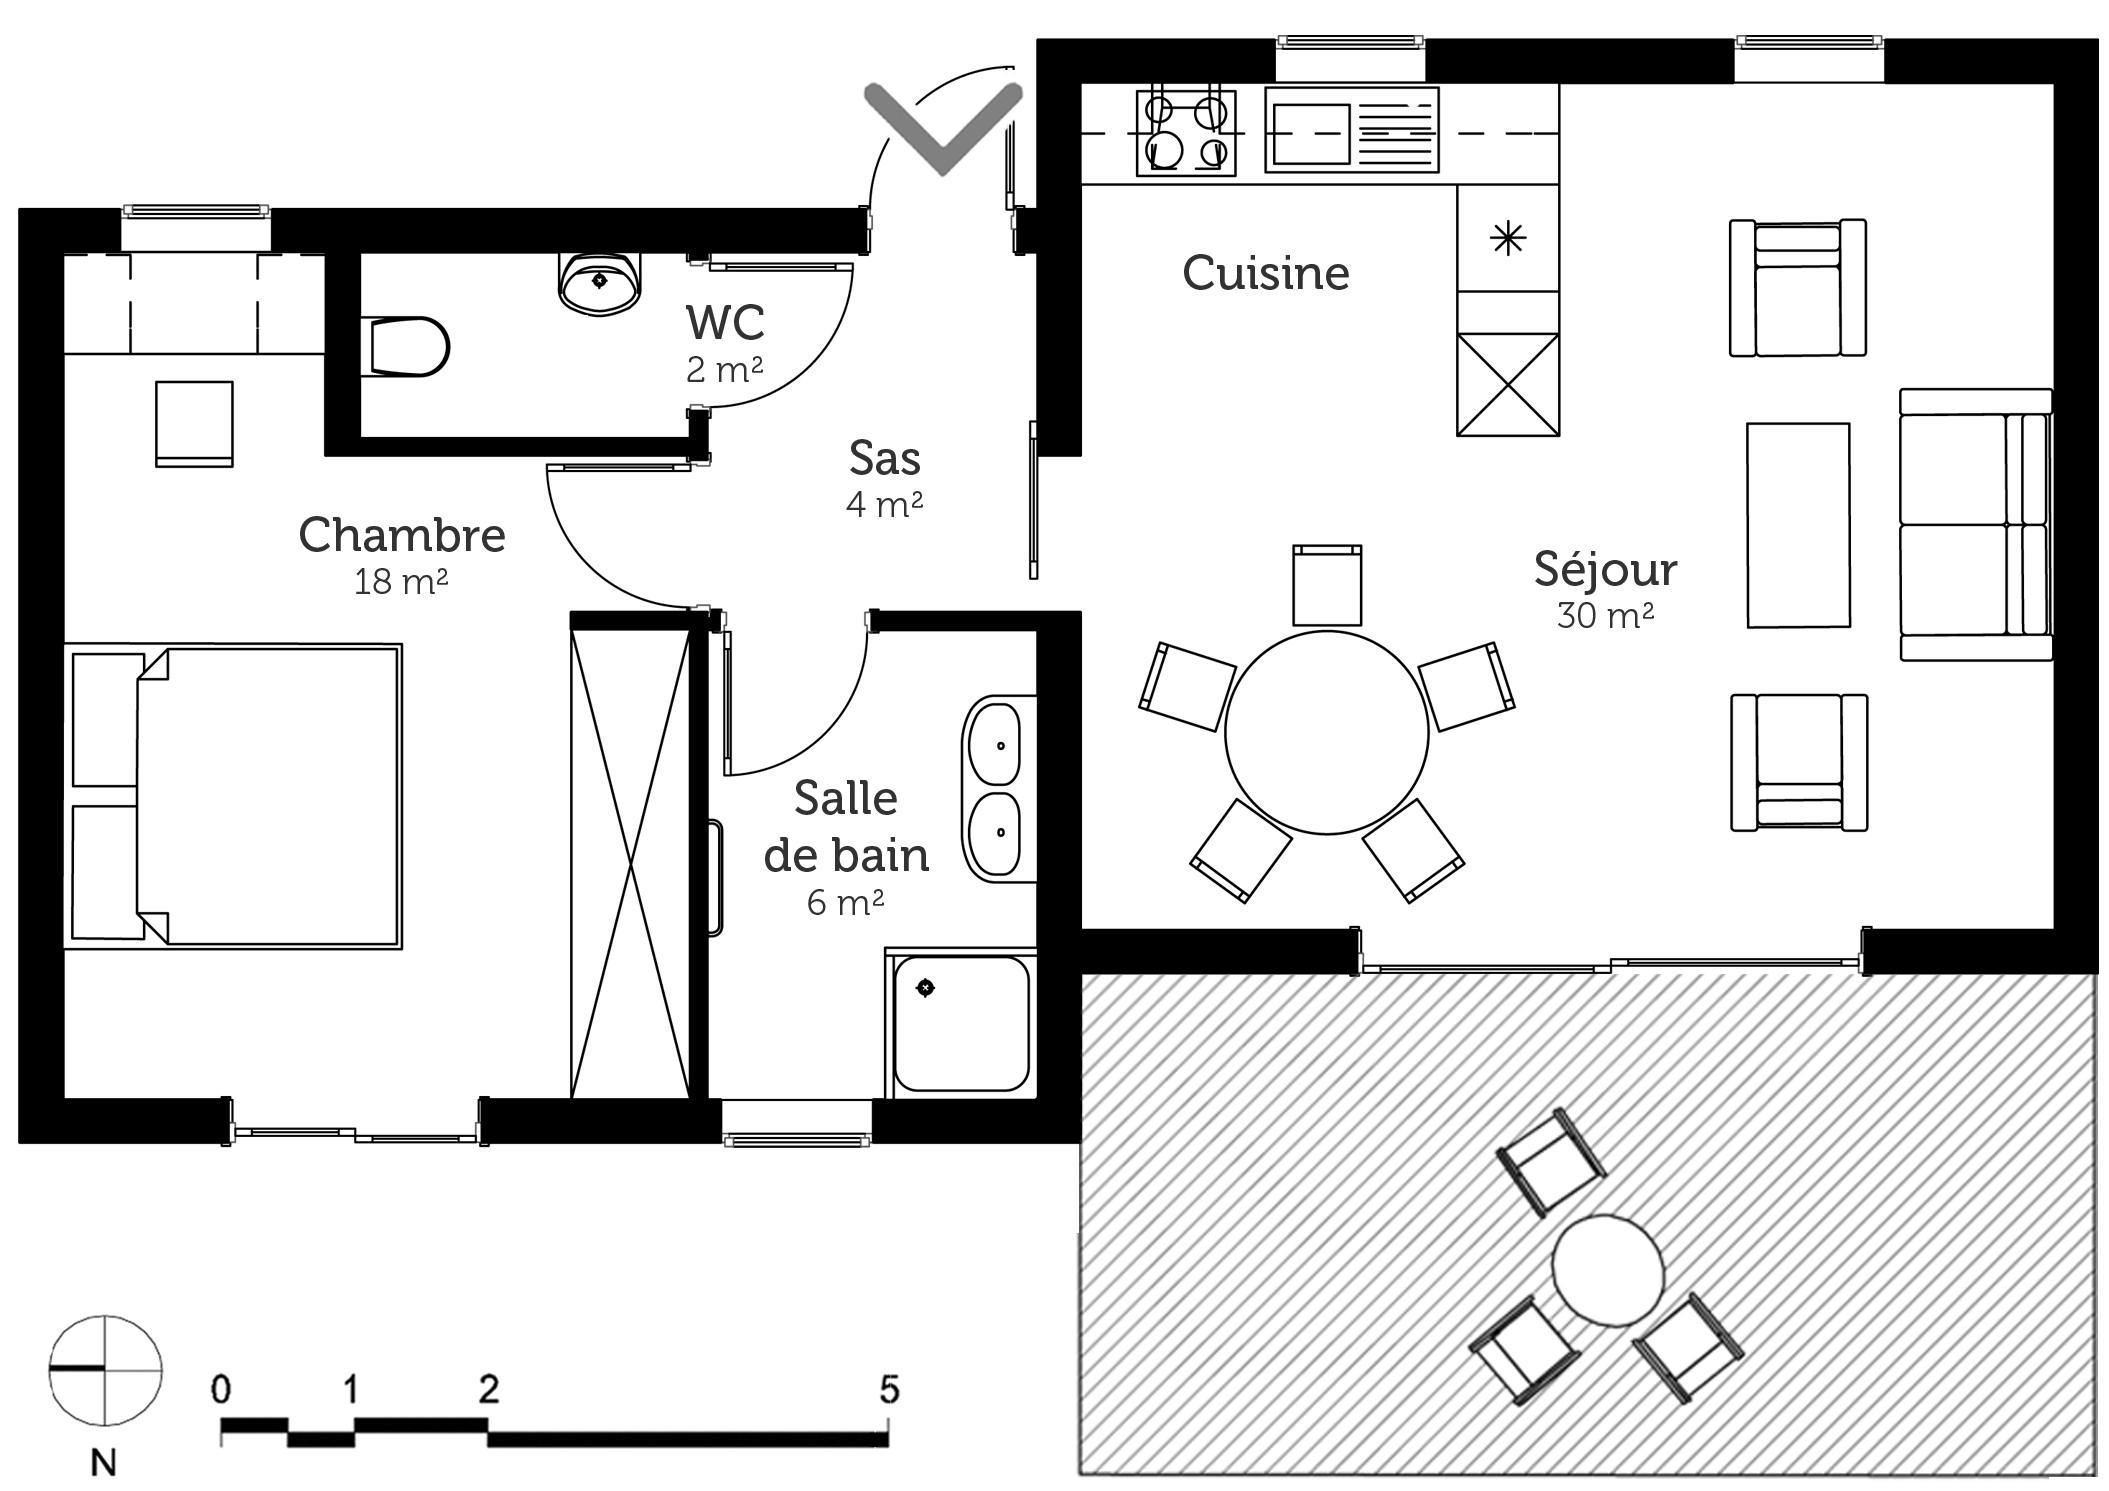 plan maison 60 m avec 1 chambre ooreka. Black Bedroom Furniture Sets. Home Design Ideas